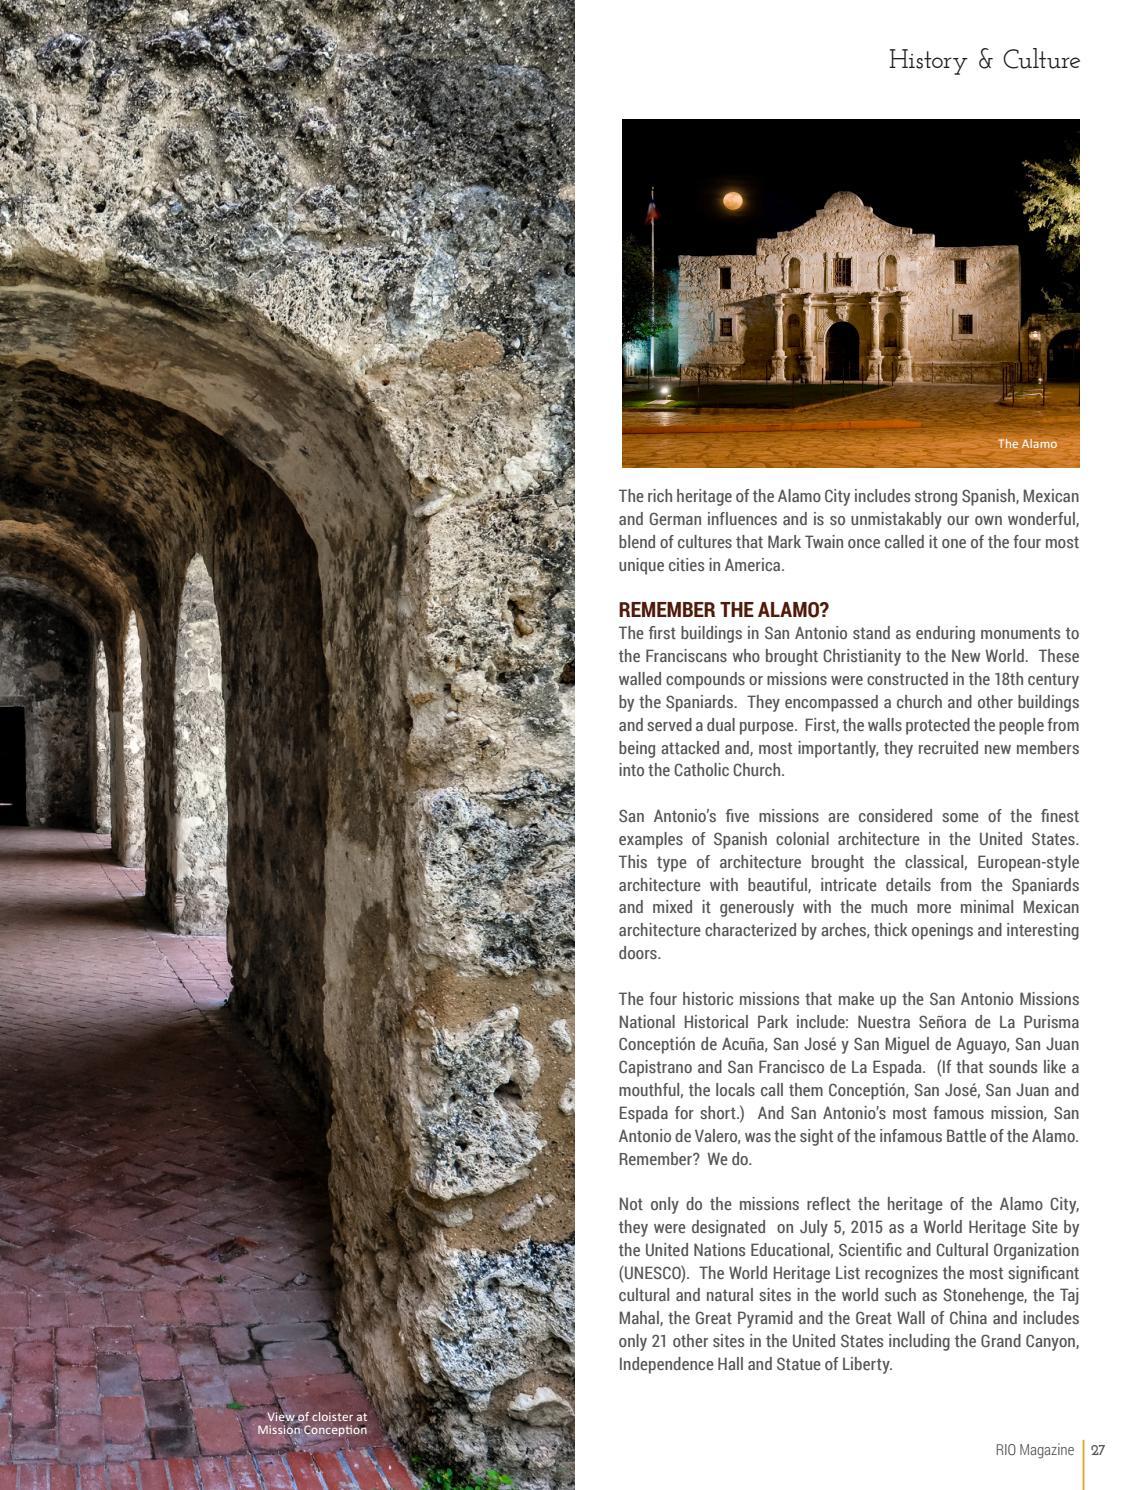 Rio magazine january 2017 by traveling blender issuu publicscrutiny Images